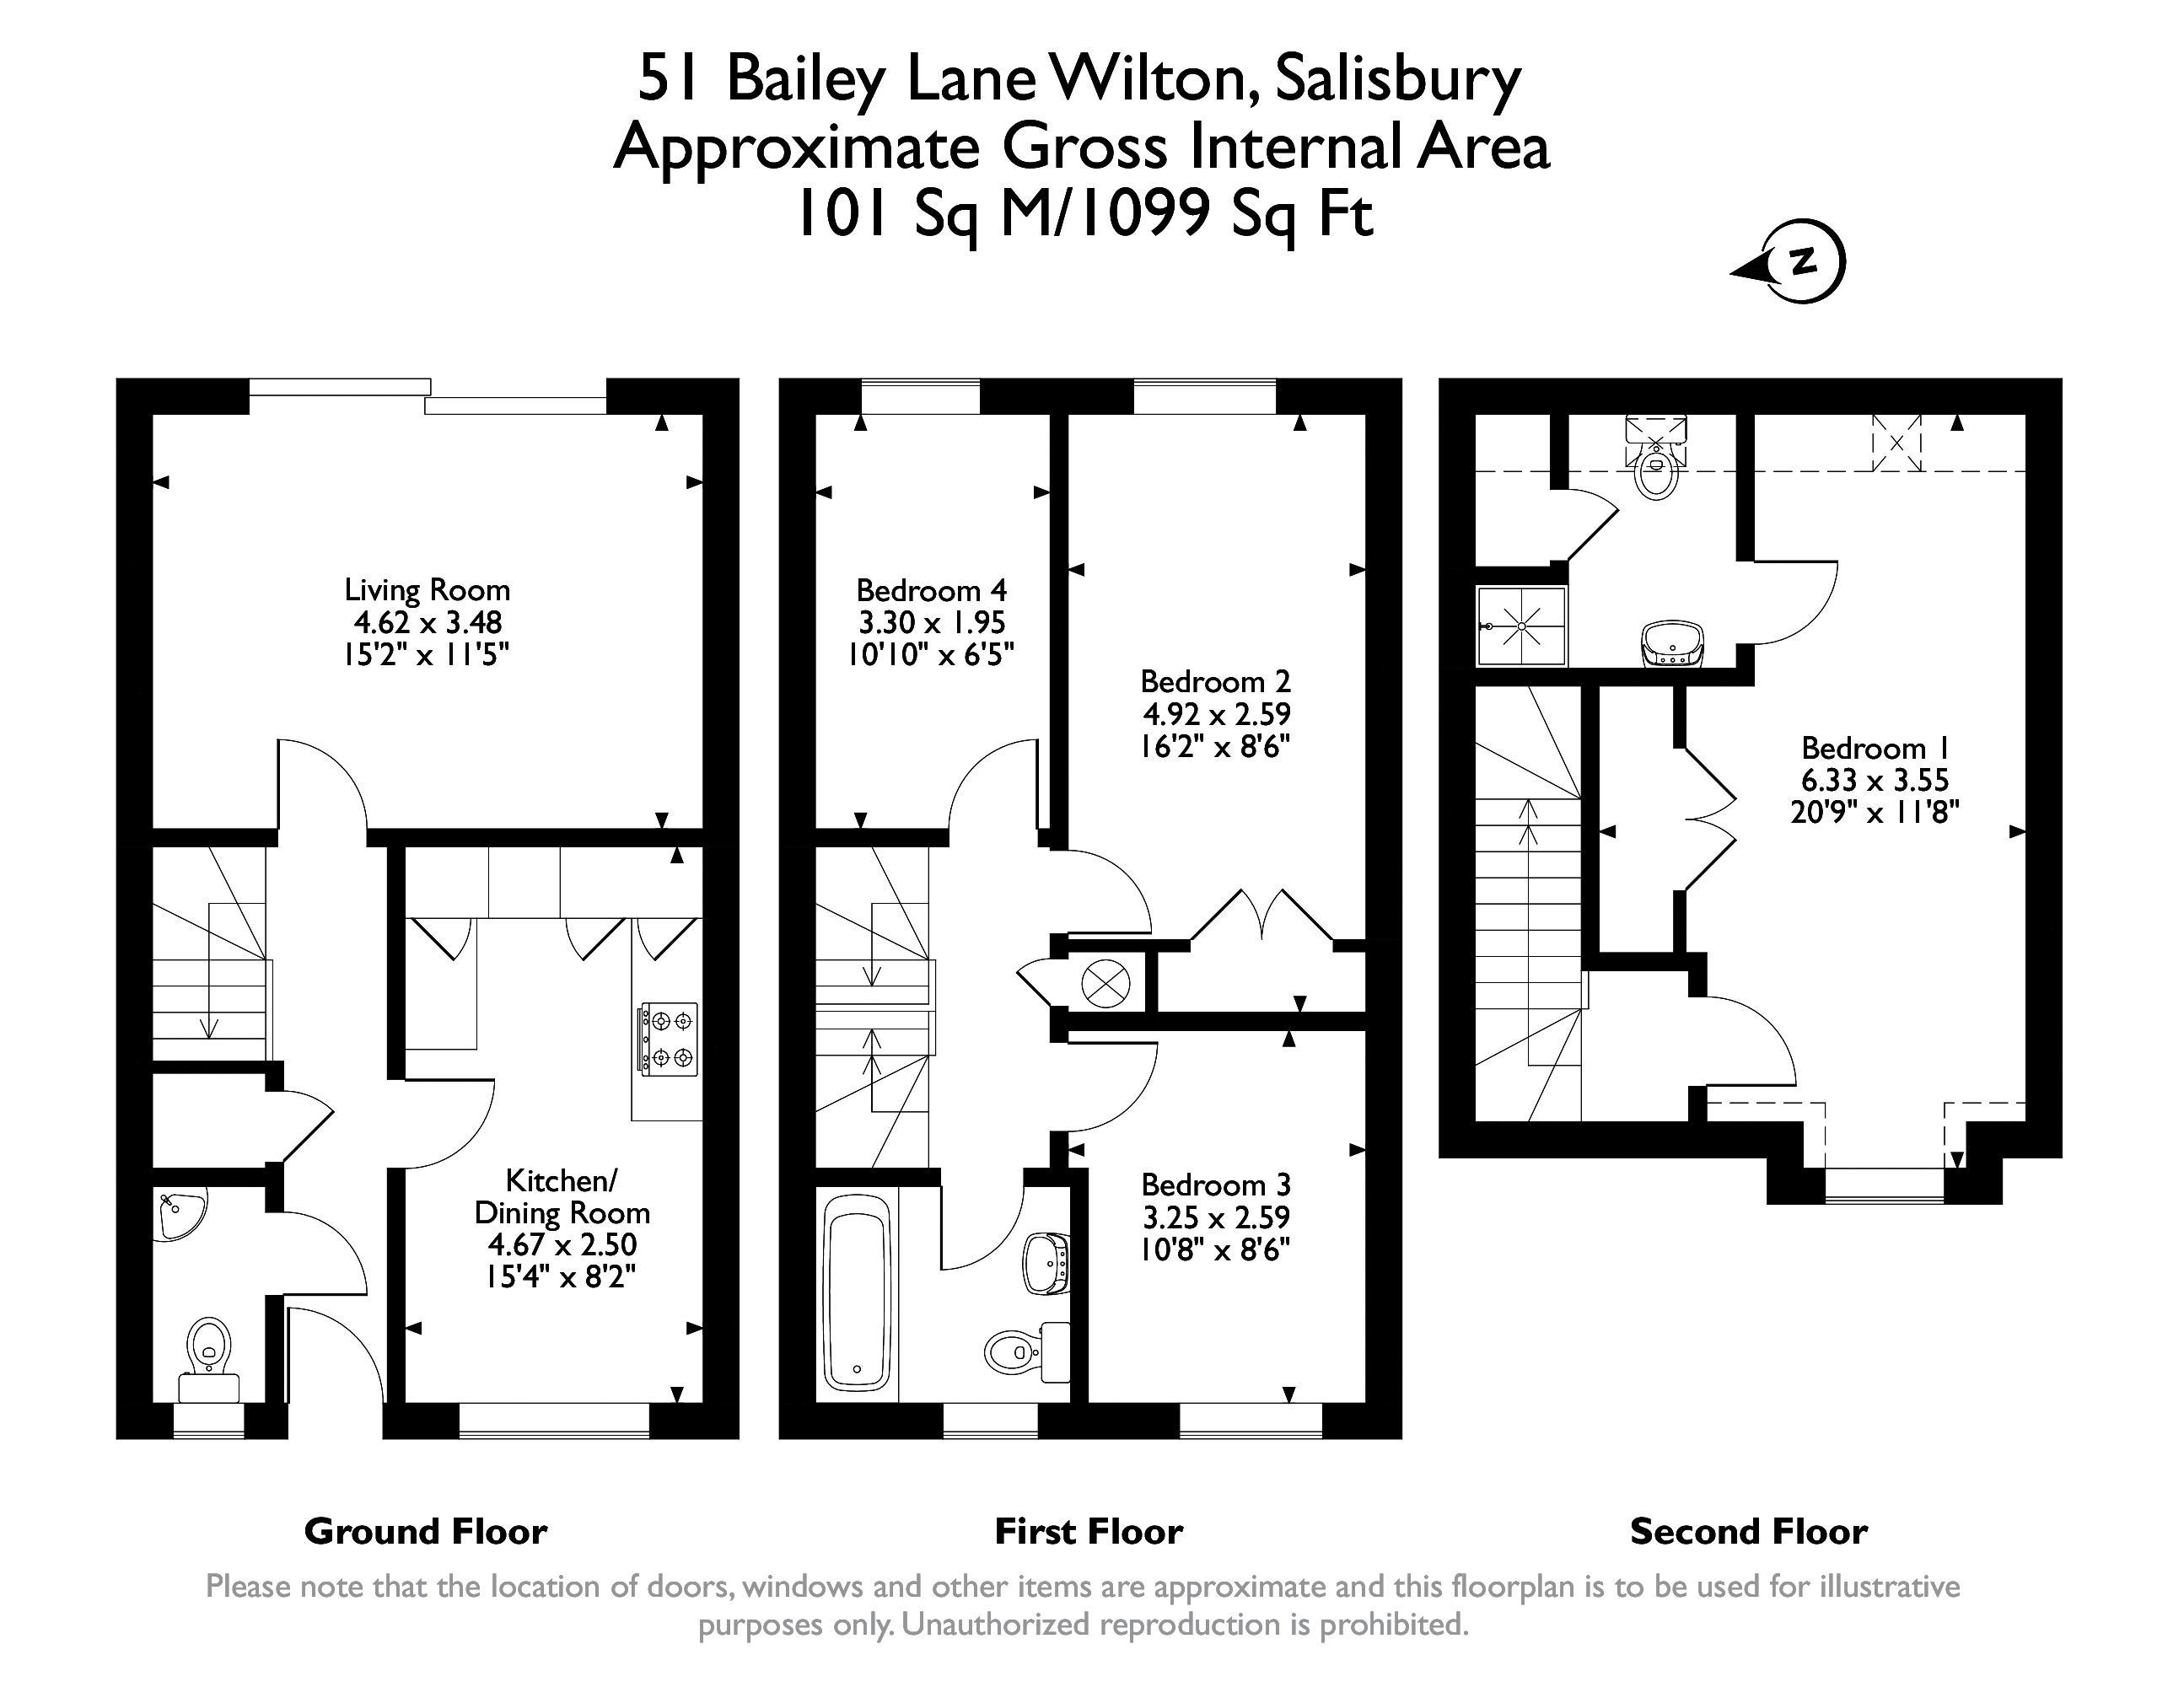 Bailey Lane Wilton